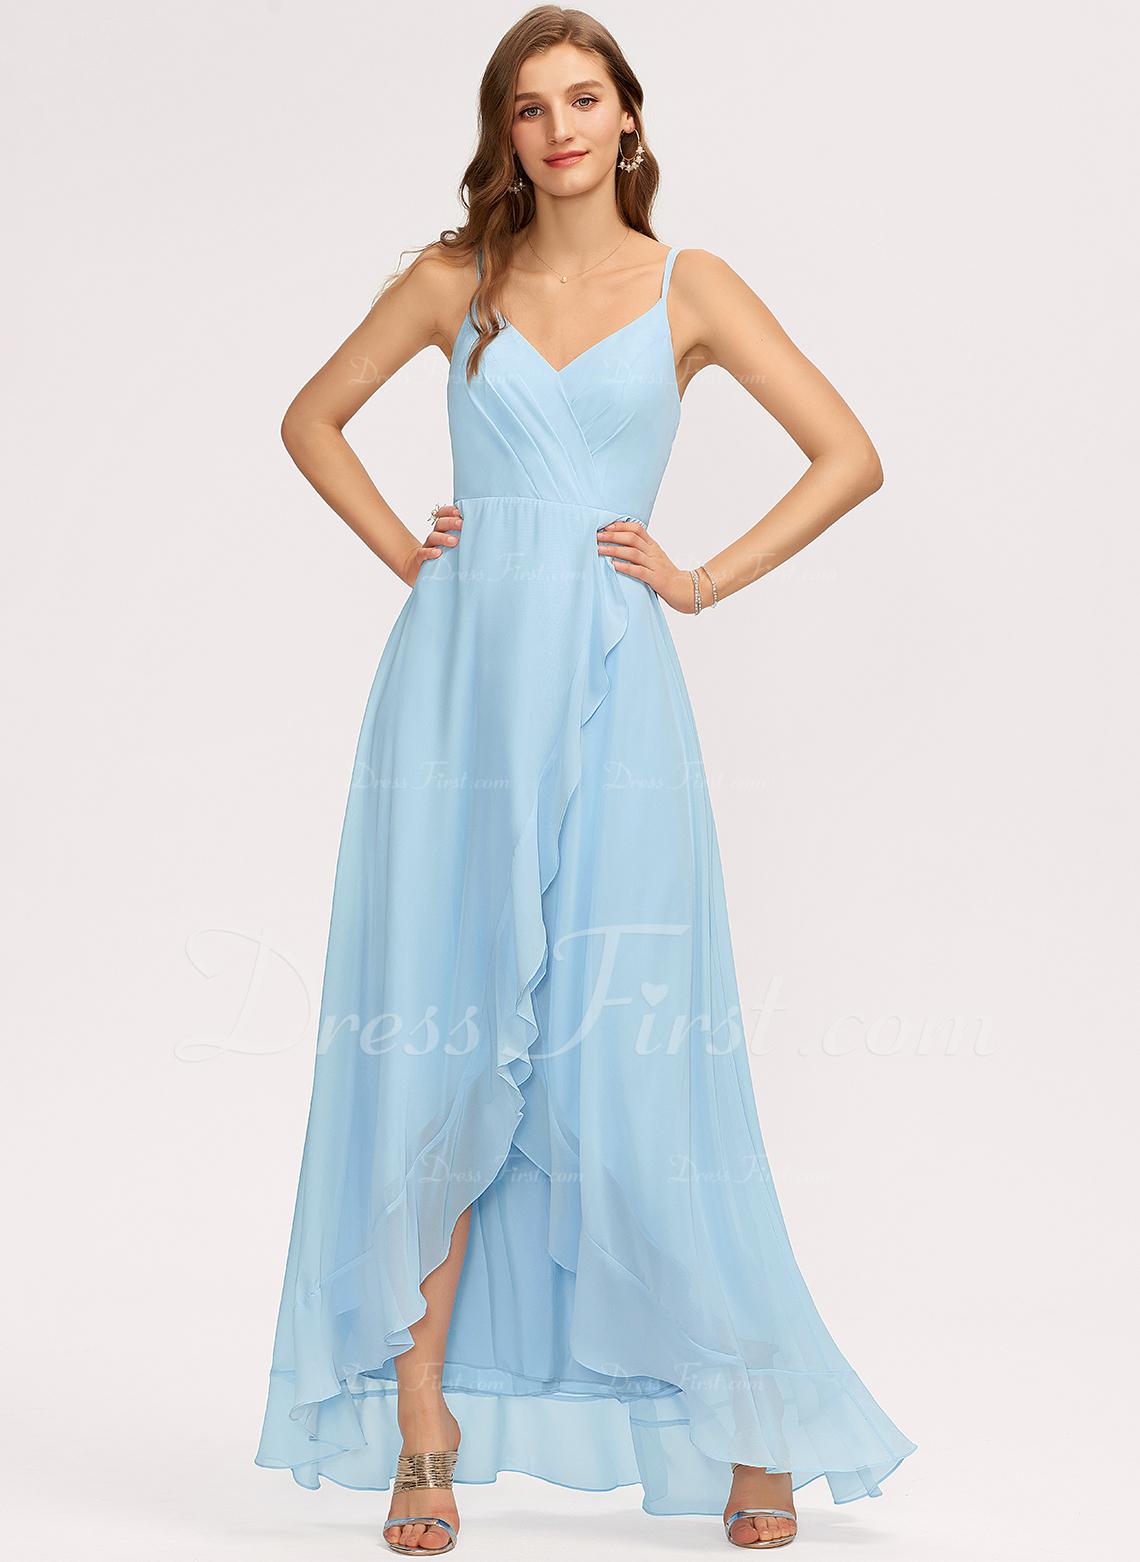 A-Line V-neck Asymmetrical Chiffon Prom Dresses With Cascading Ruffles